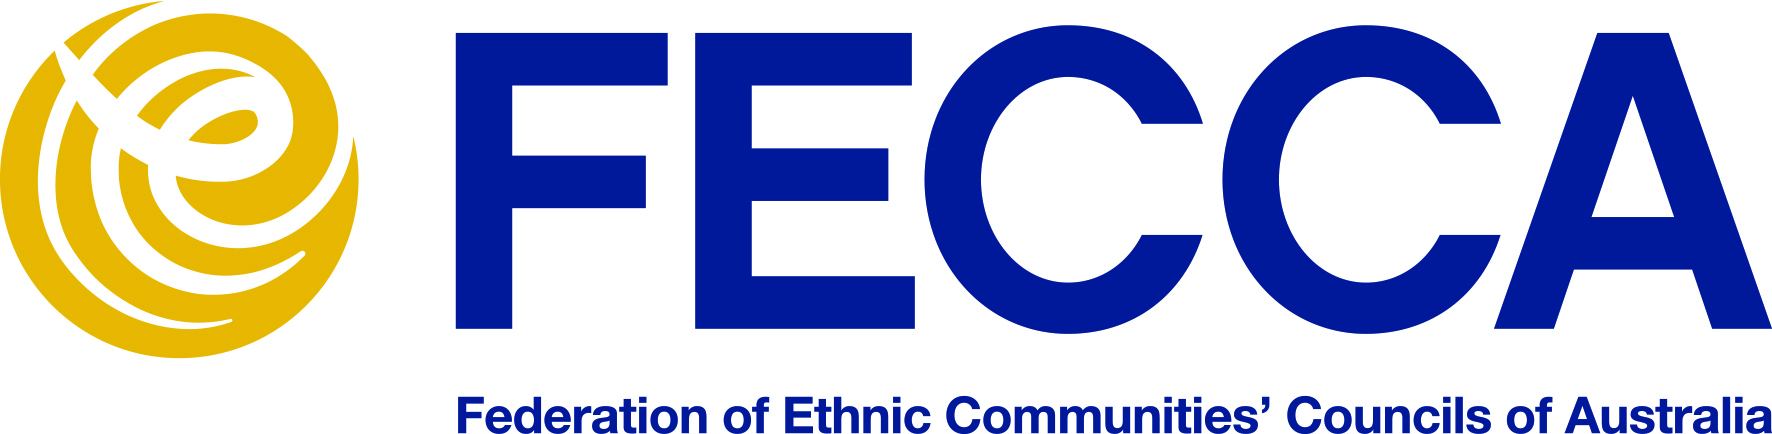 2145-FECCA_logo_CMYK.jpg